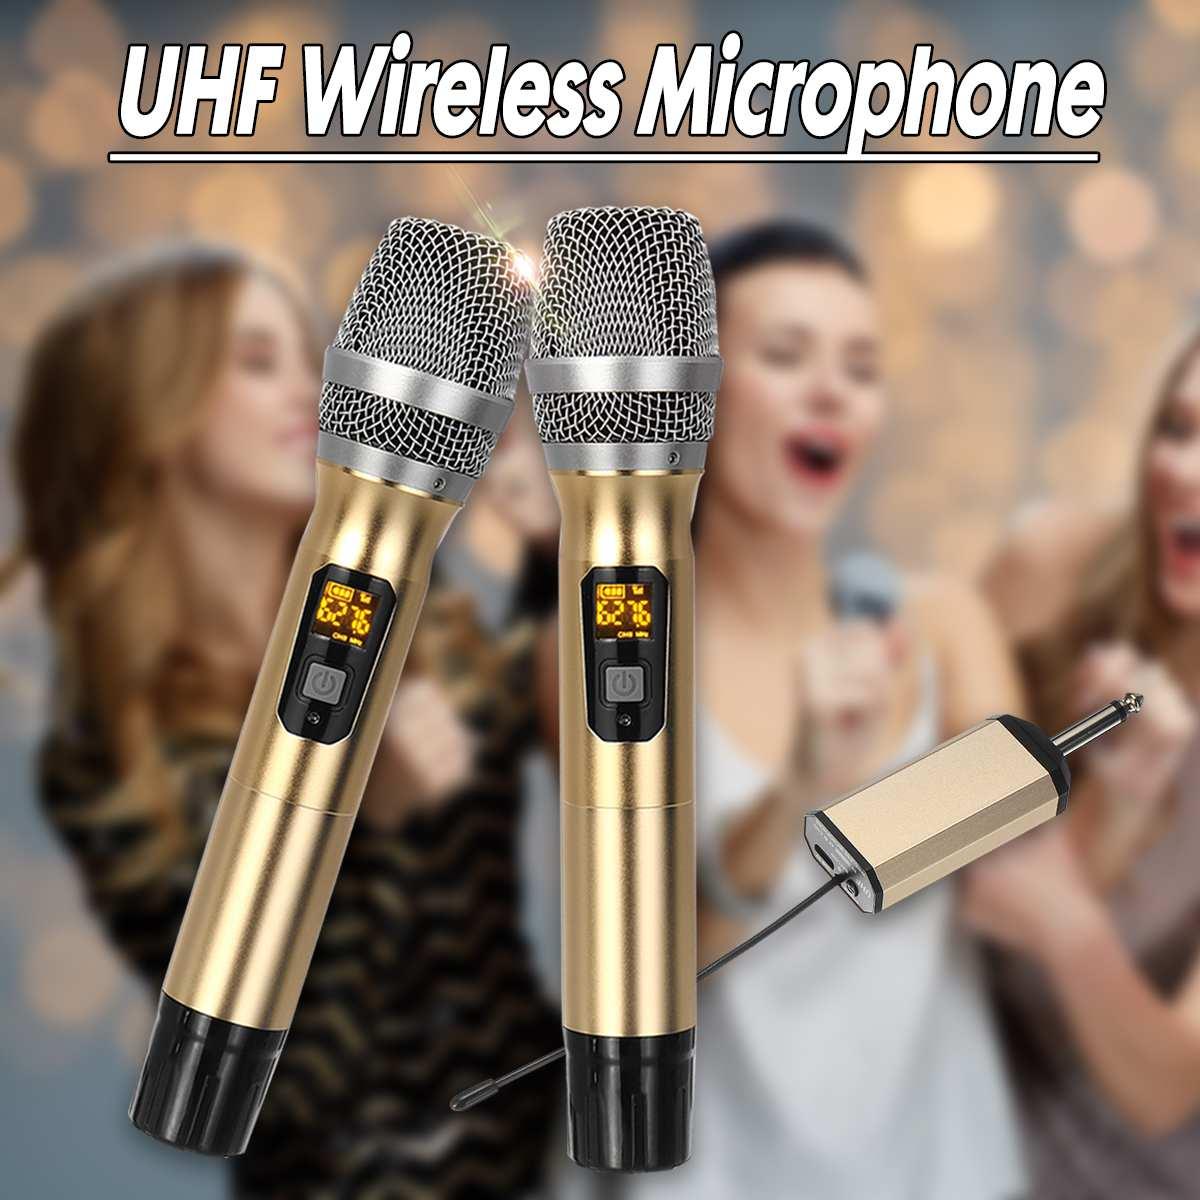 Sistema con micrófono inalámbrico UHF portátil, 2 micrófonos de mano, reproductor de altavoz con receptor Digital para Show de Bar